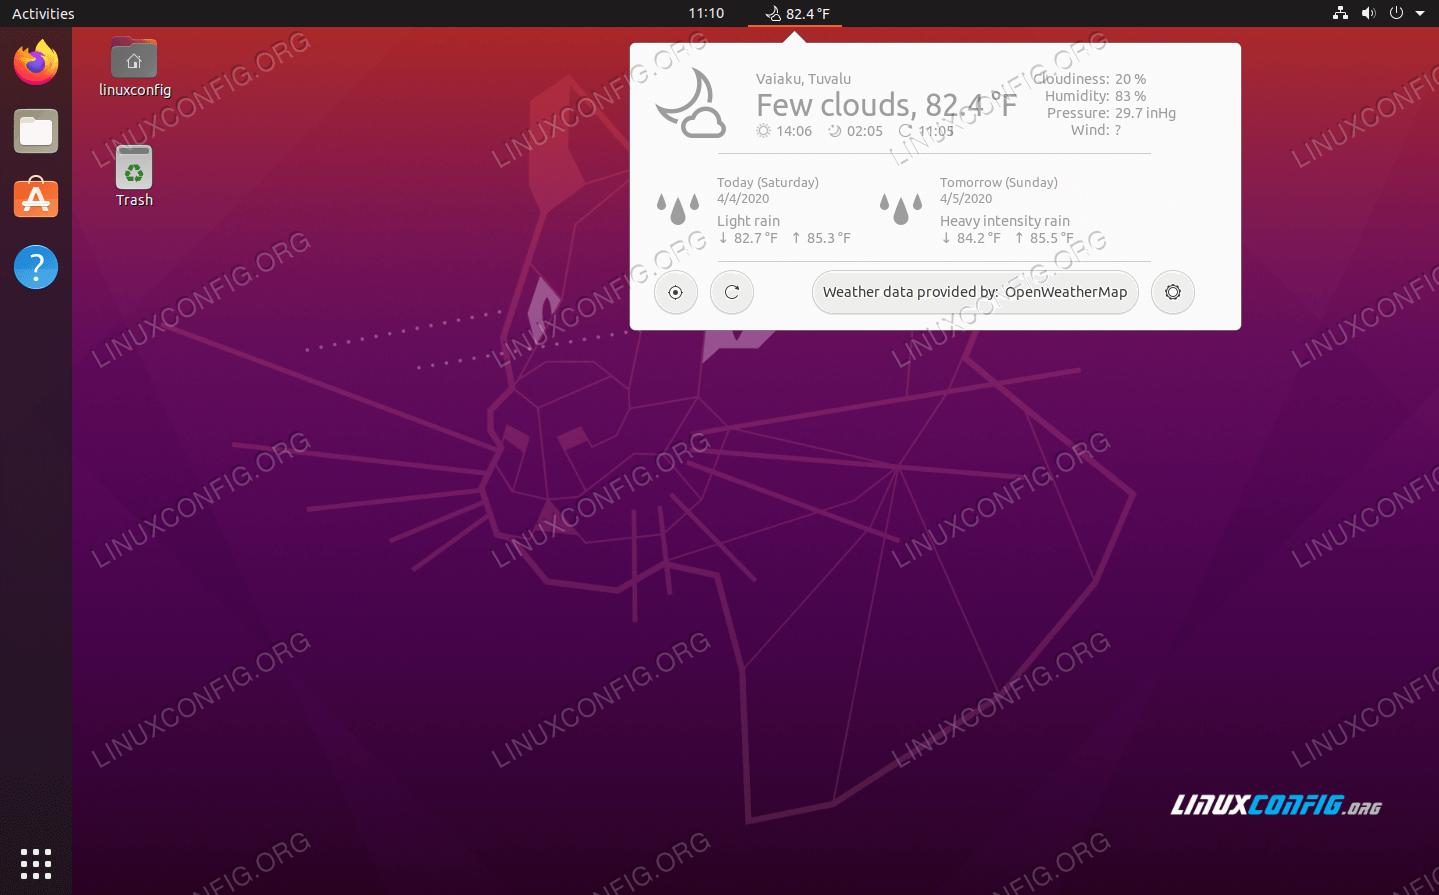 Running a Gnome Shell Extension of Ubuntu 20.04 Focal Fossa